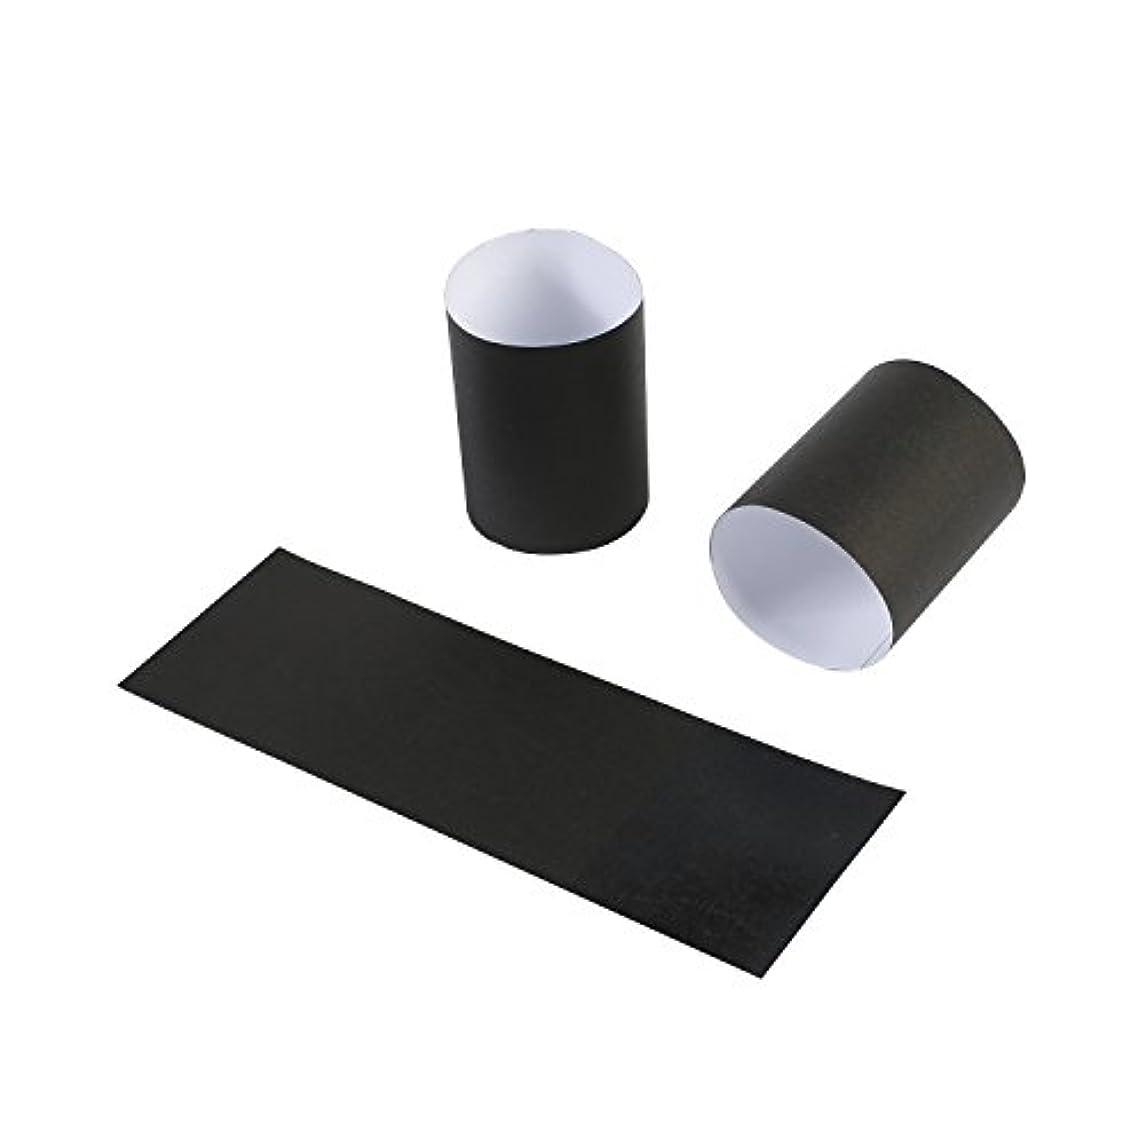 Gmark Paper Napkin Band Box of 2500 (Black), Paper Napkin Rings self Adhesive GM1049